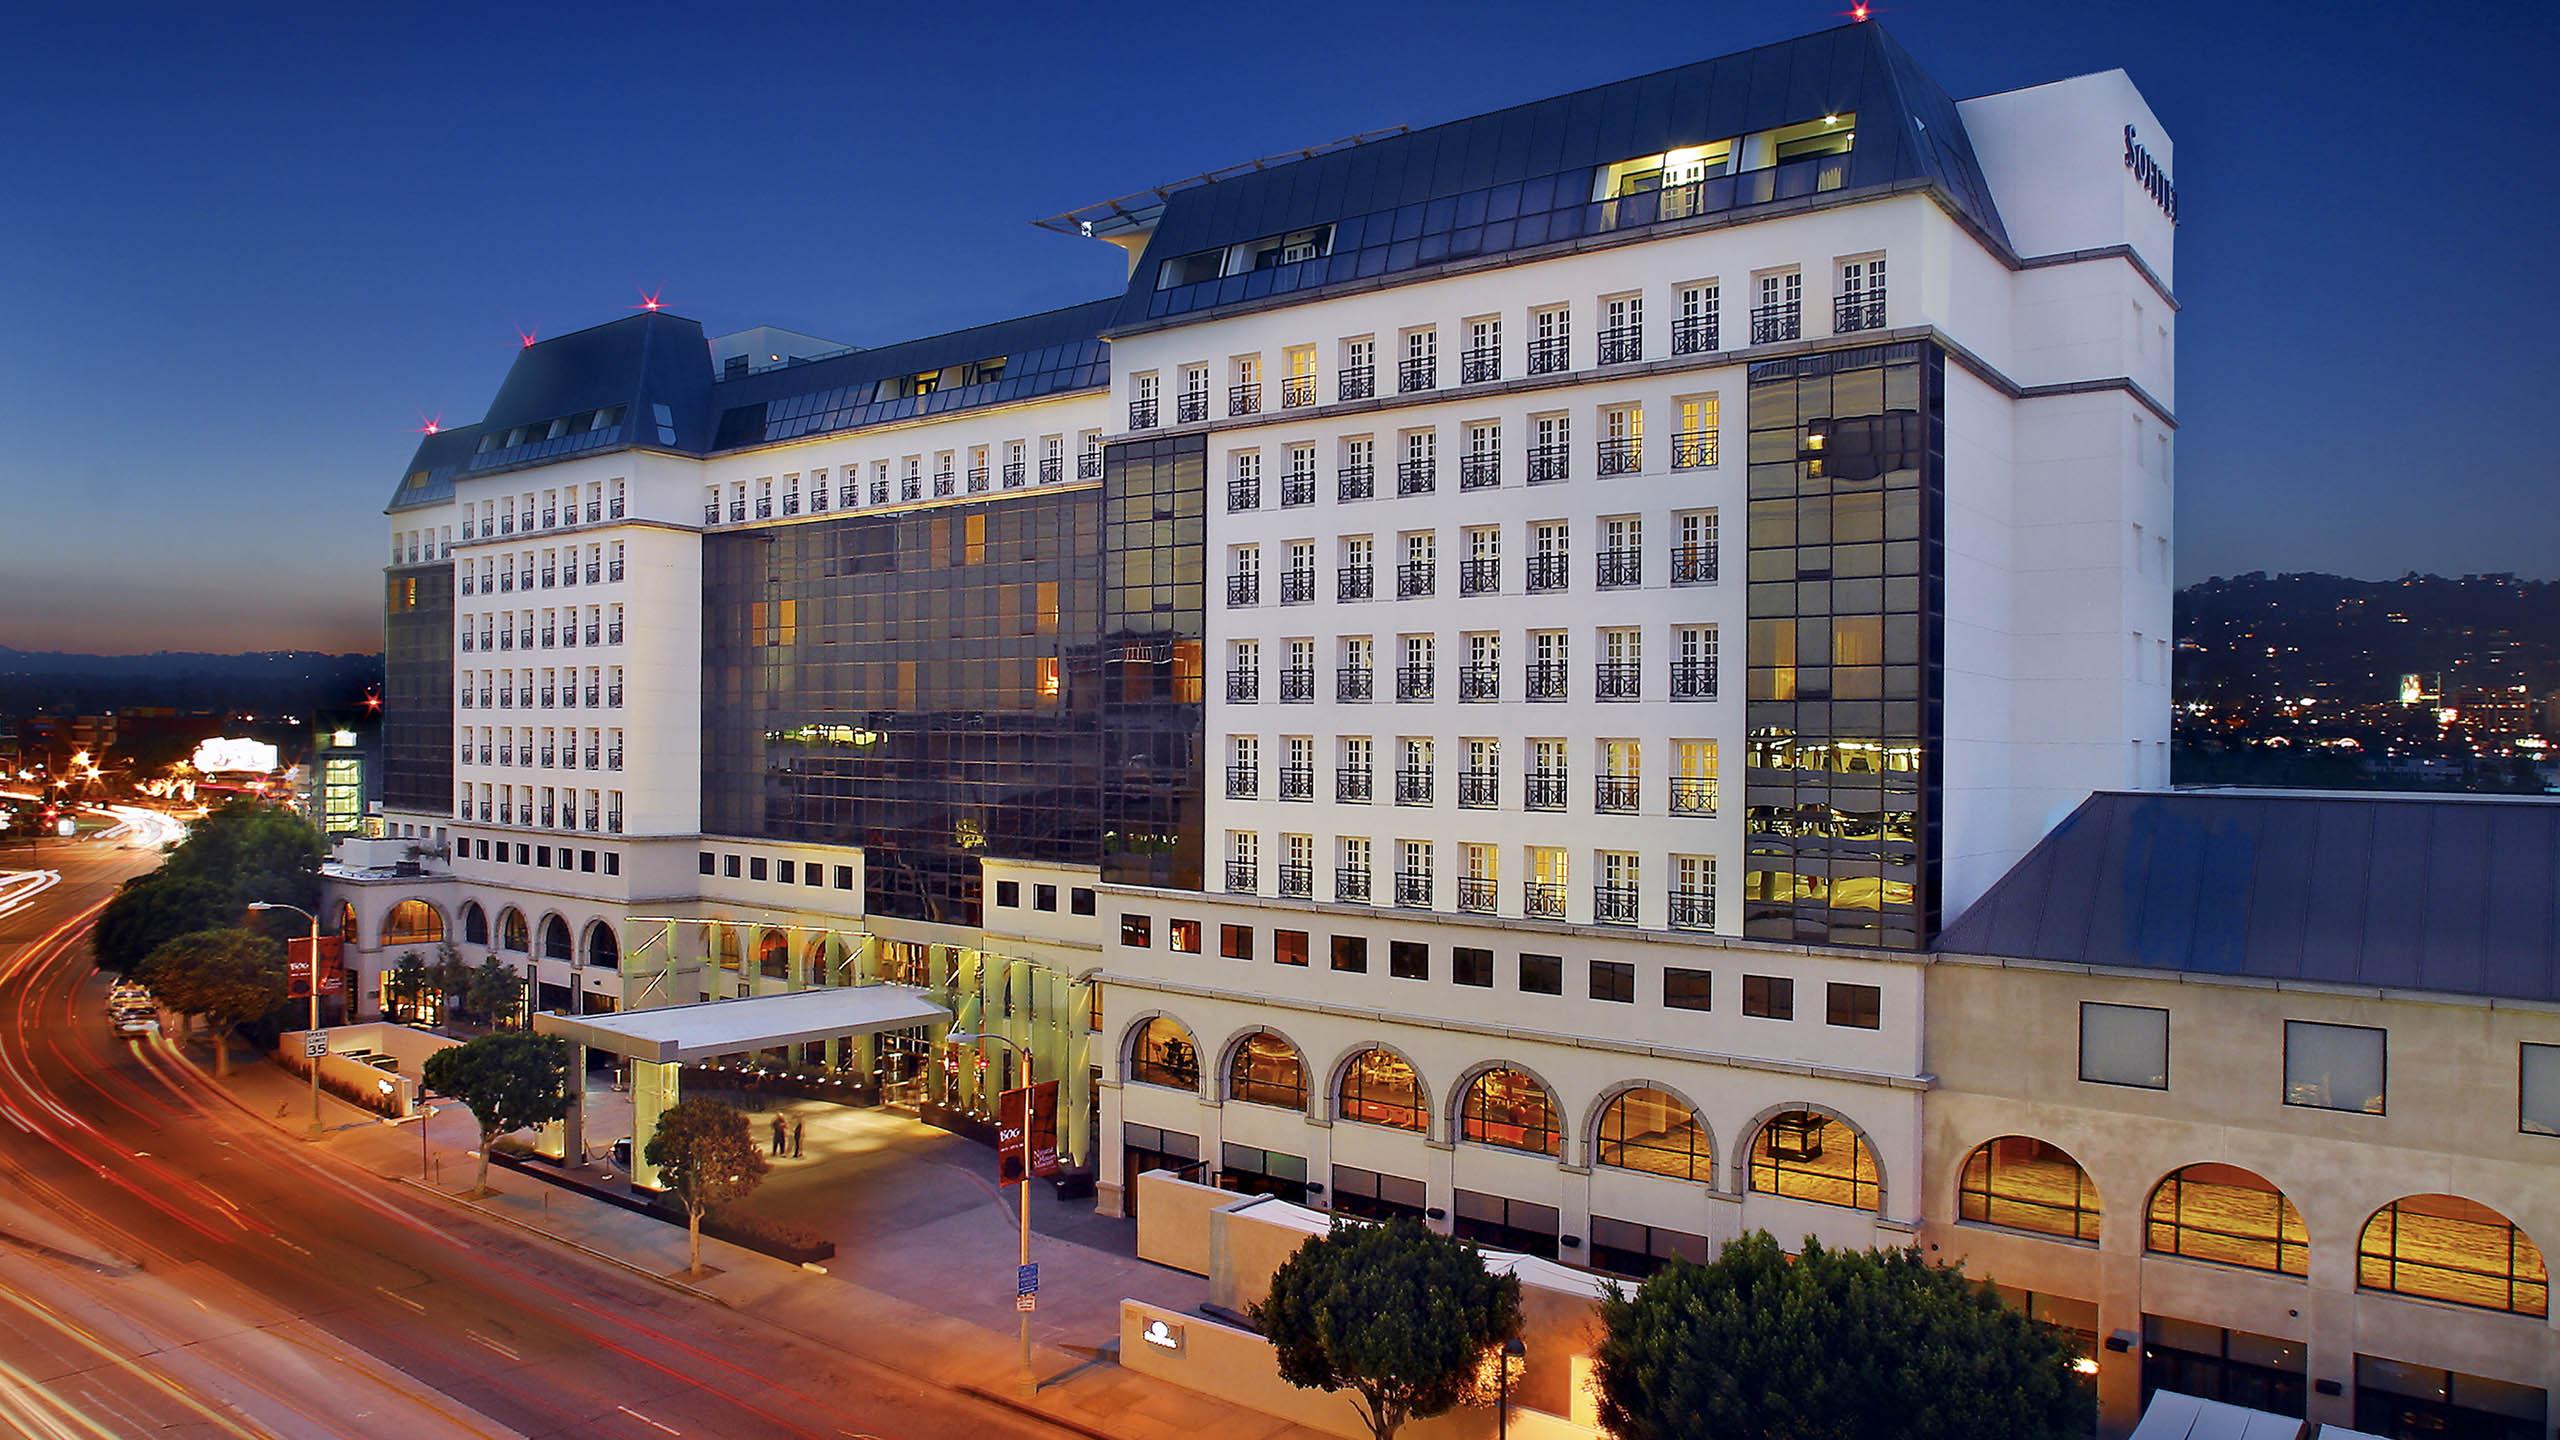 Sofitel hotel, Los Angeles